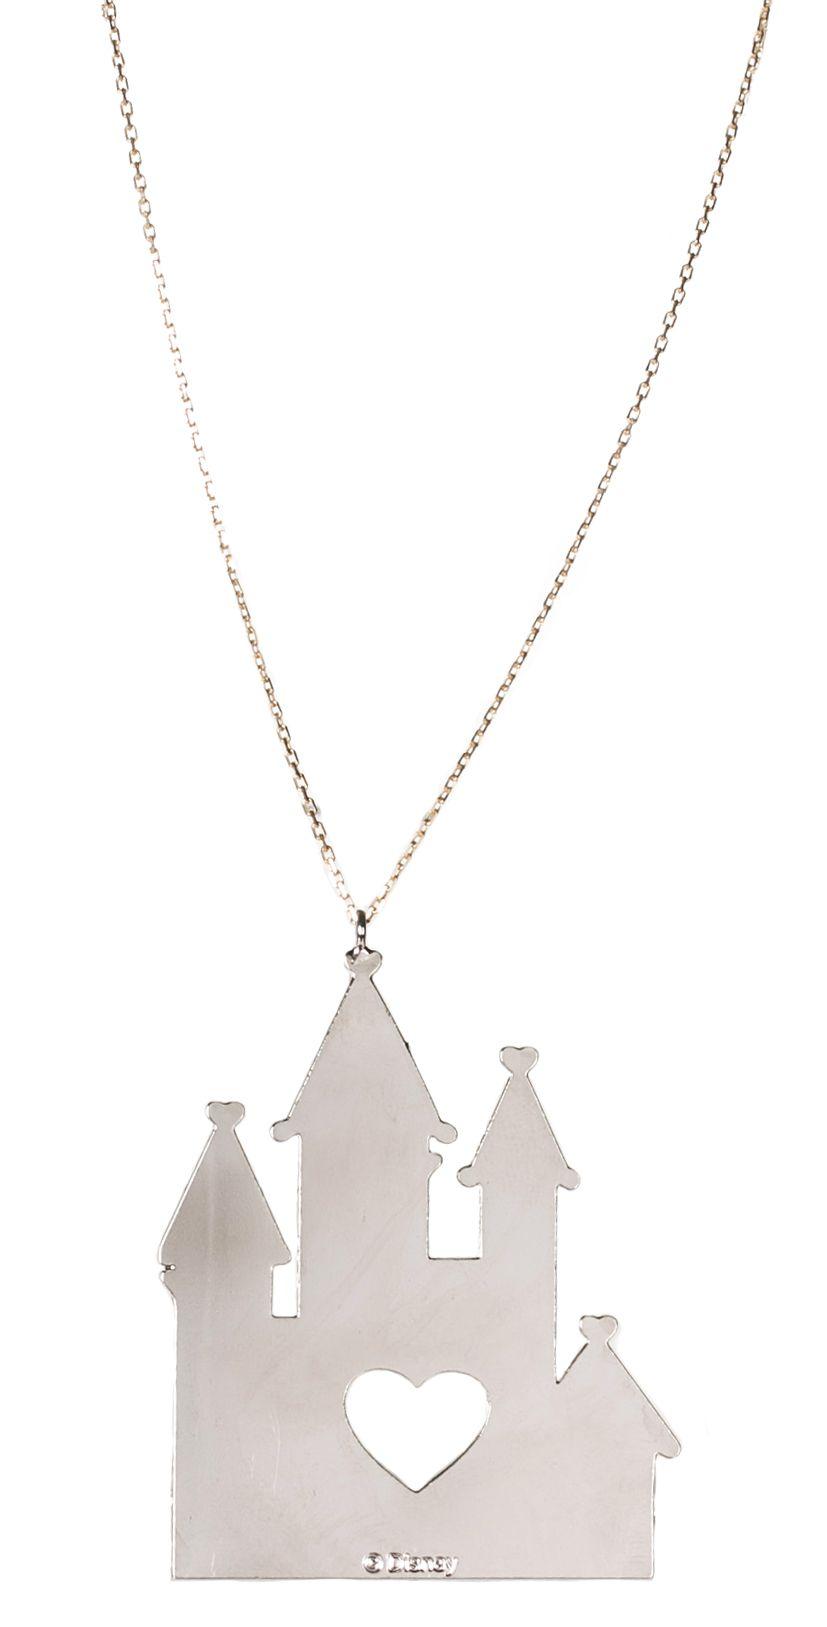 Silver #Disney Castle #Necklace from Gogo Philip xoxo | Disney ...